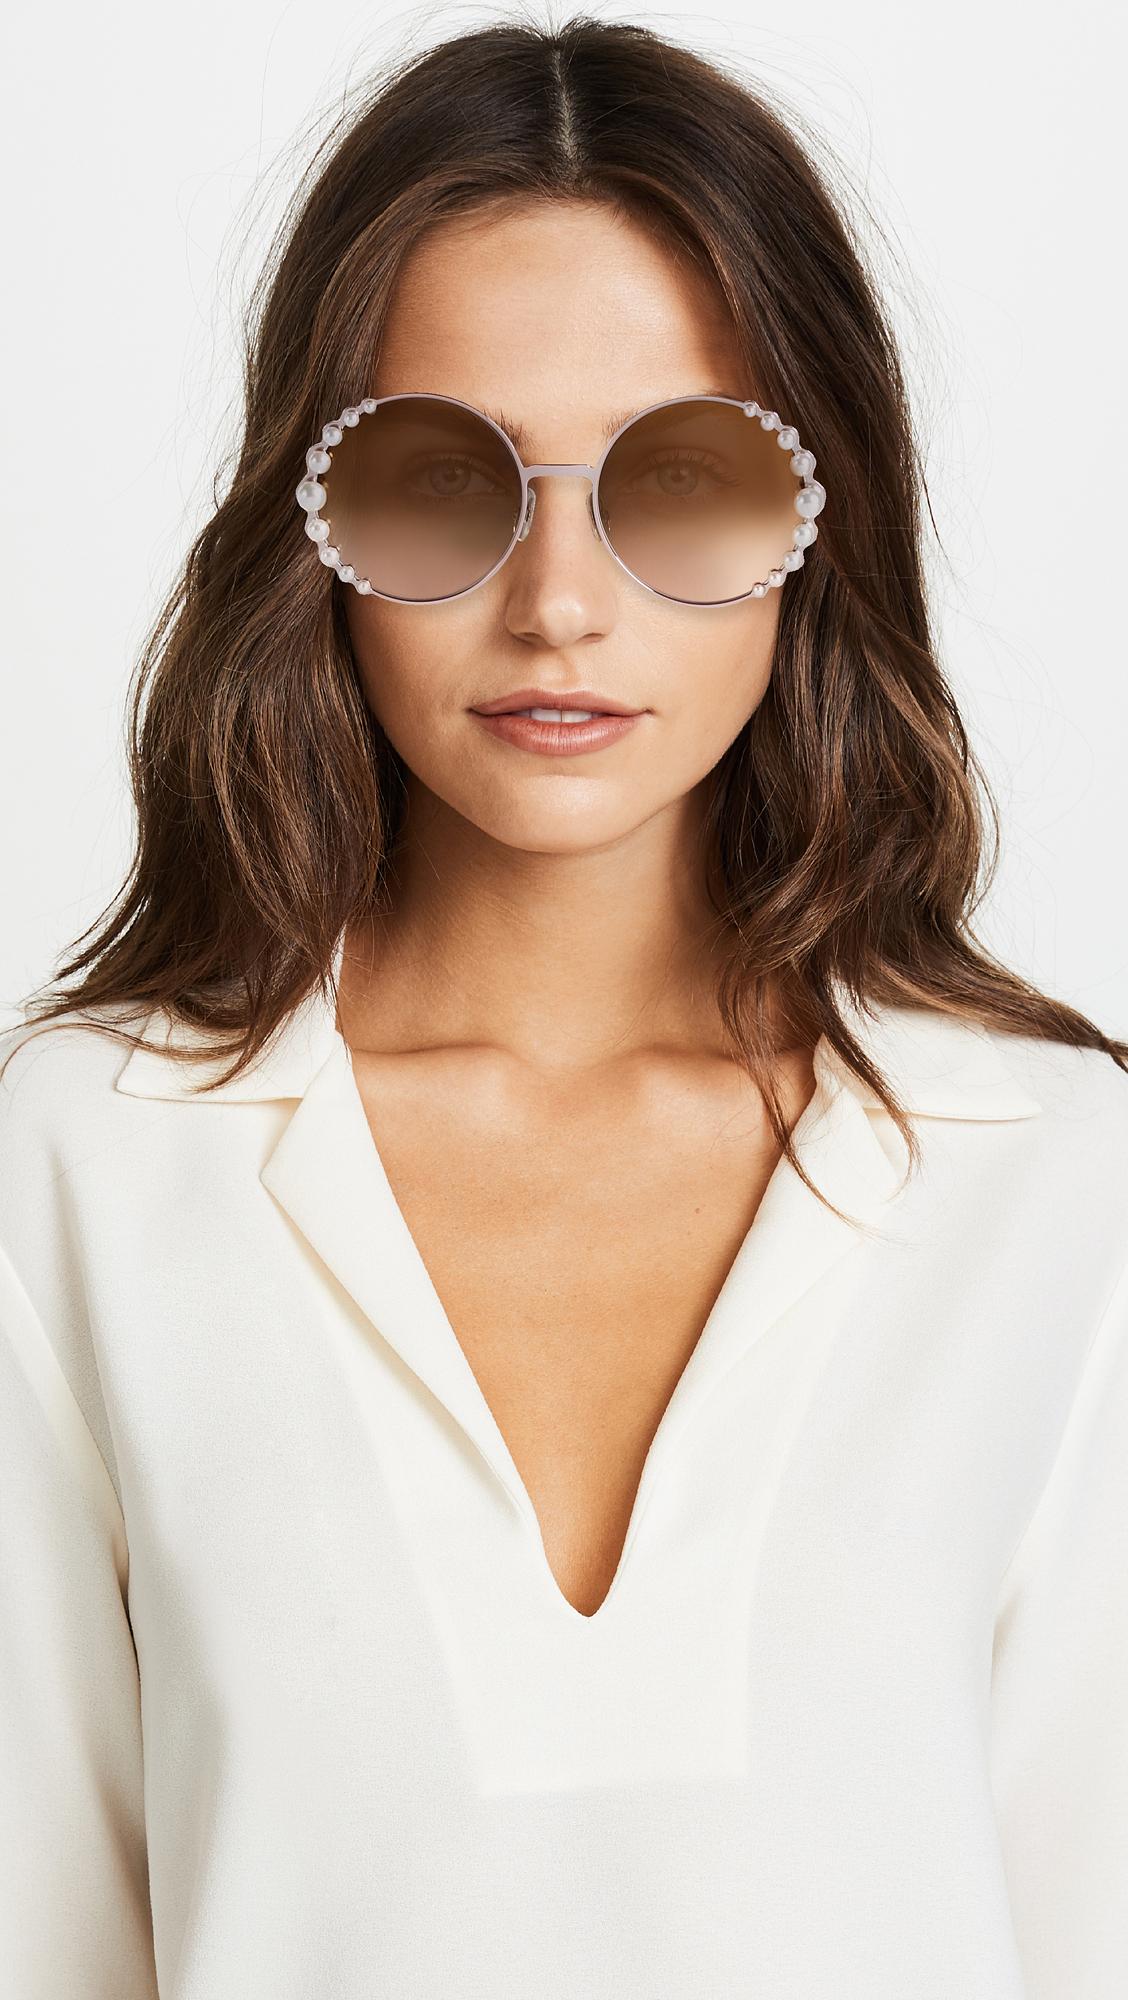 a598fbfd146 Fendi Round Pearl Frame Sunglasses